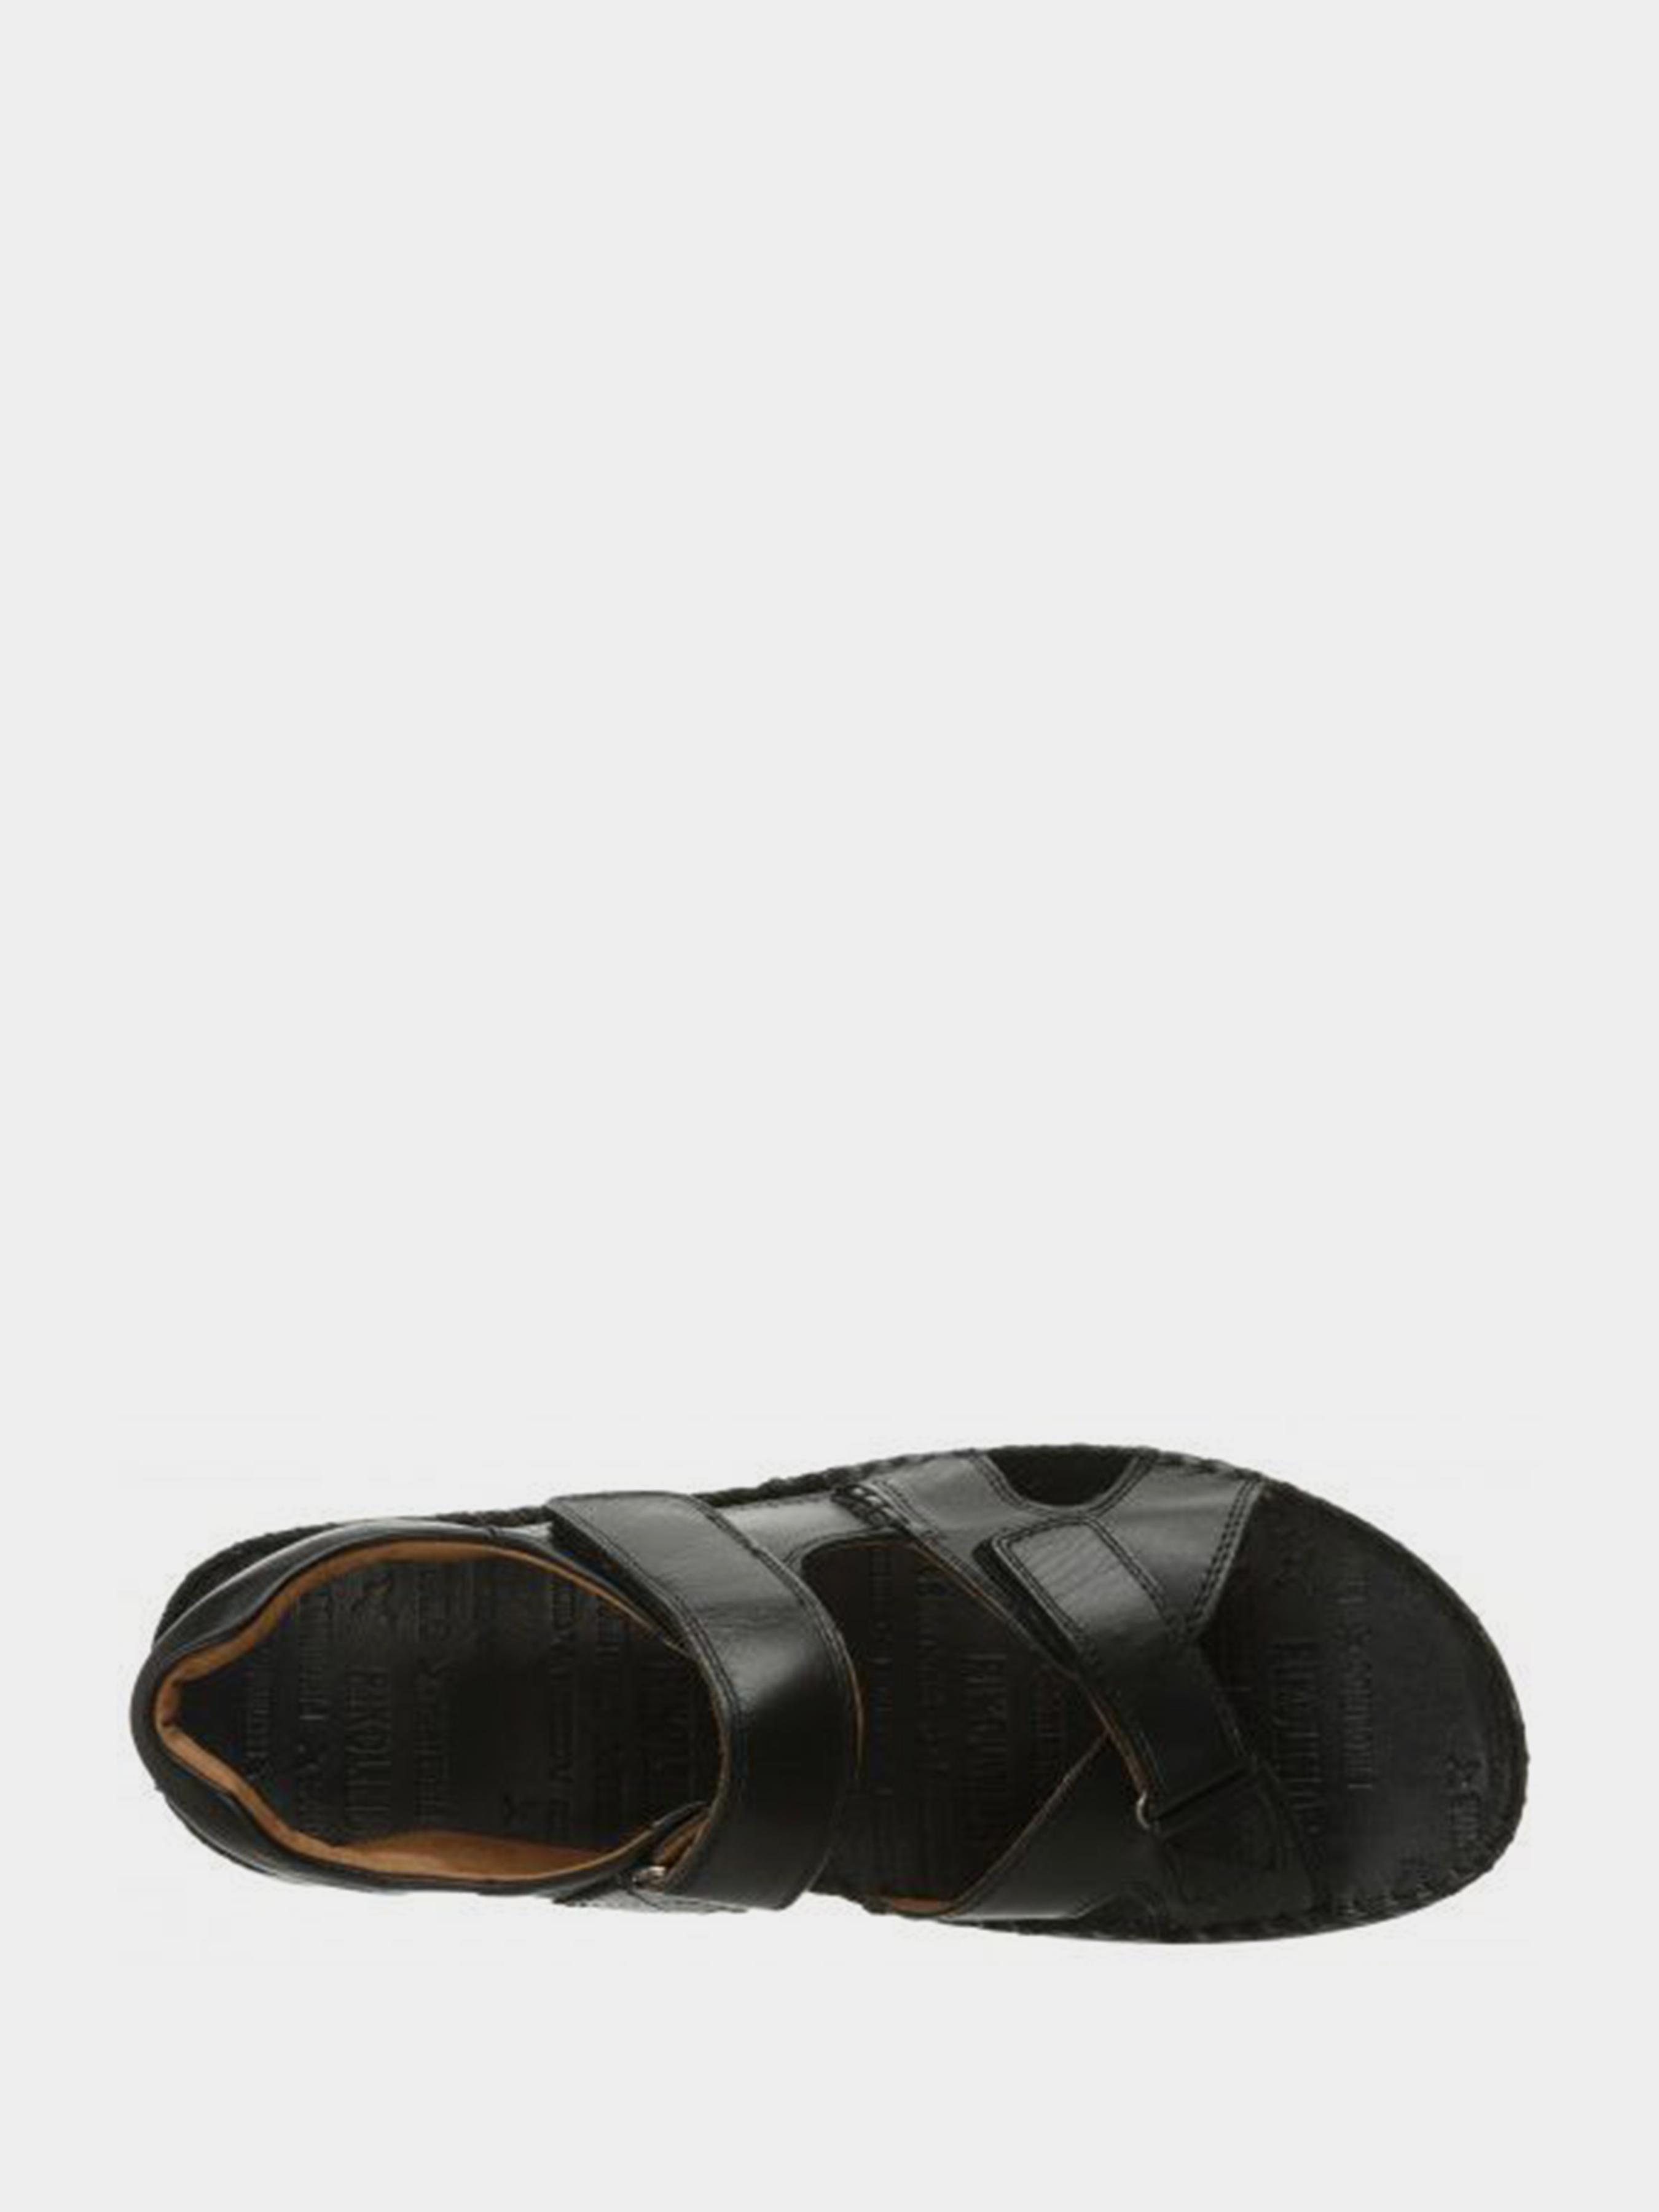 Сандалии для мужчин PIKOLINOS TARIFA SH159 купить обувь, 2017